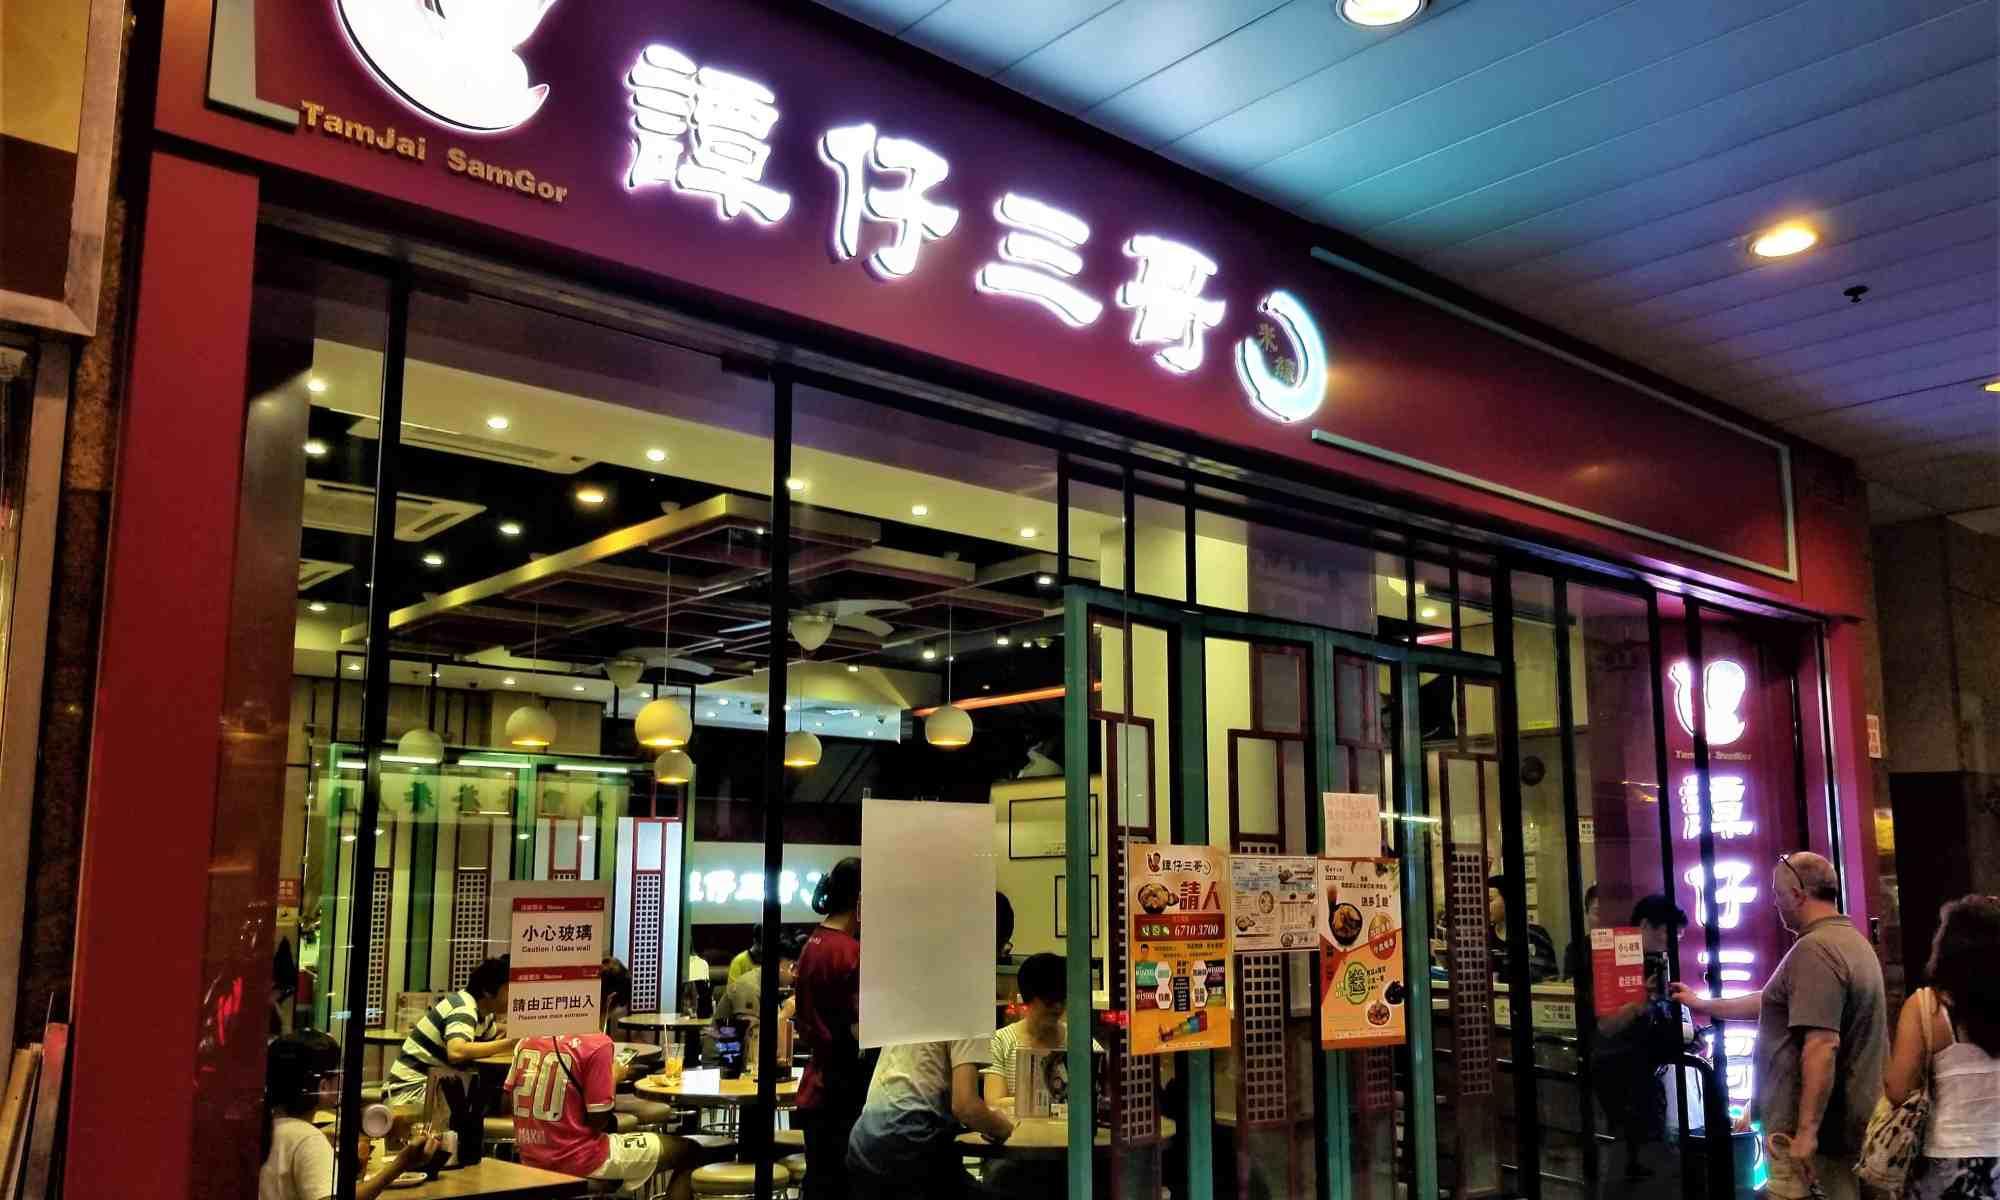 image-of-tamjai-samgor-yunnan-noodle-shop-facade